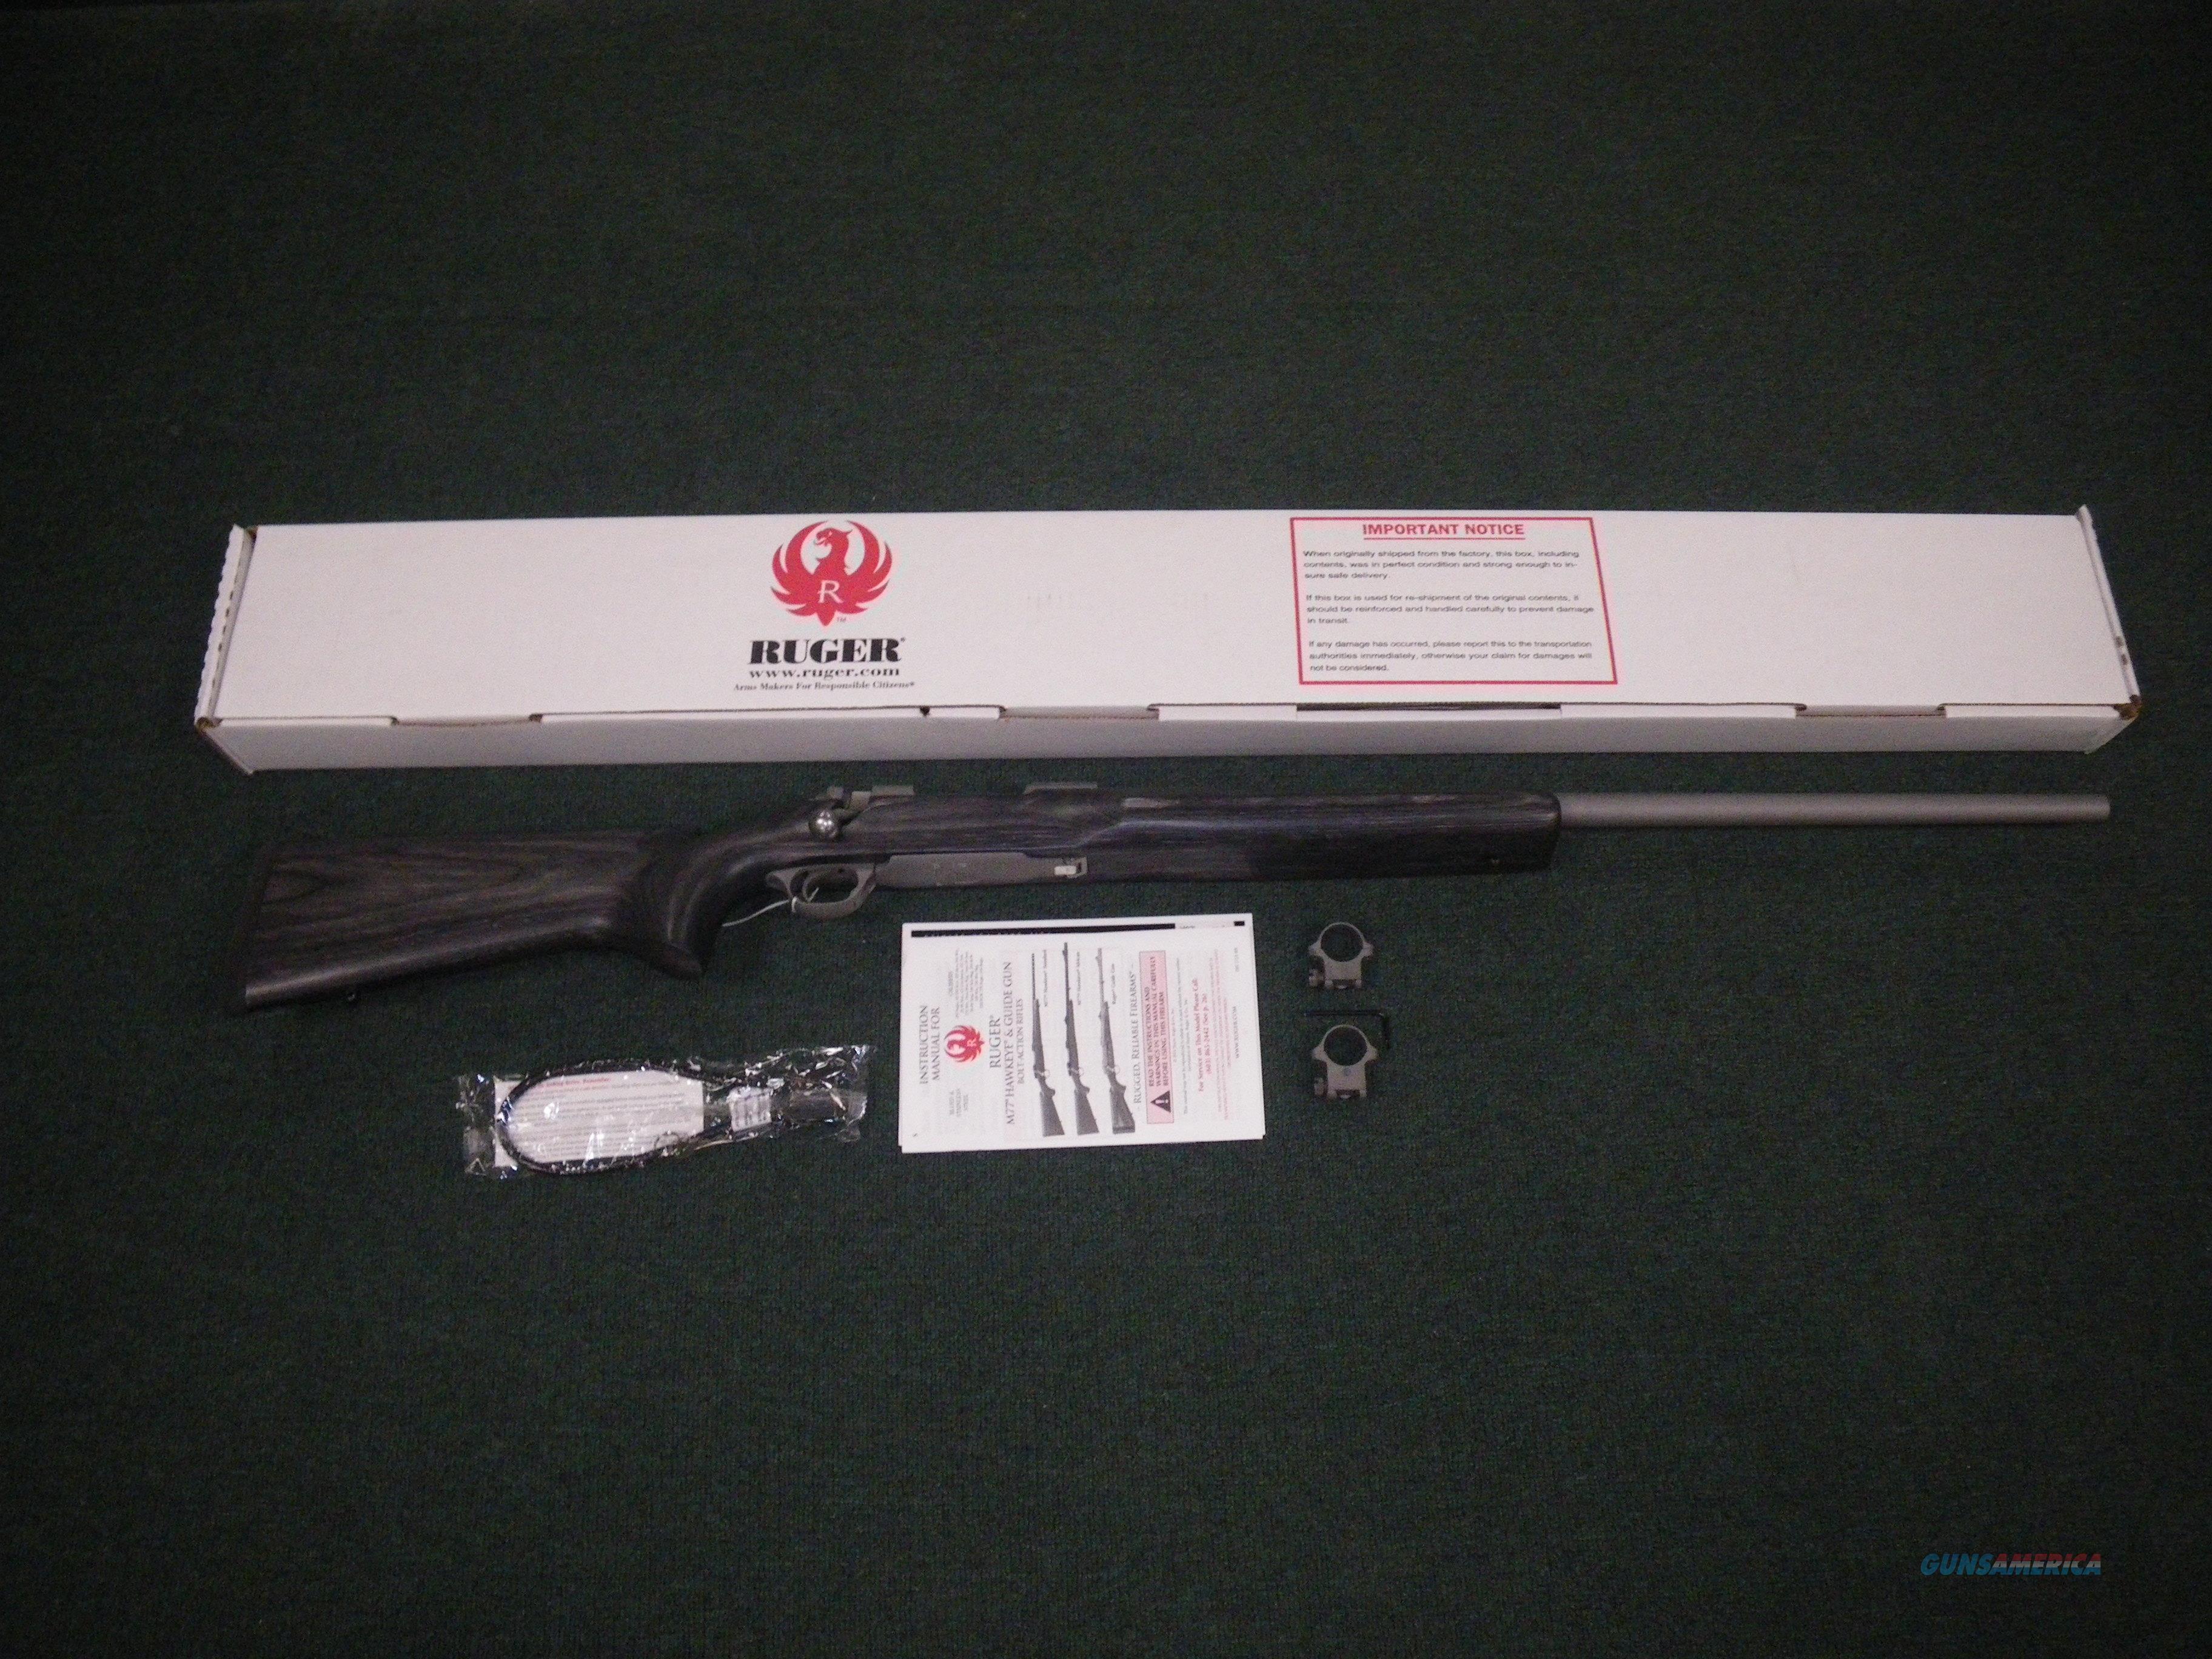 "Ruger Hawkeye Varmint Target Rifle 6.5 Creed 28"" NEW #17980  Guns > Rifles > Ruger Rifles > Model 77"